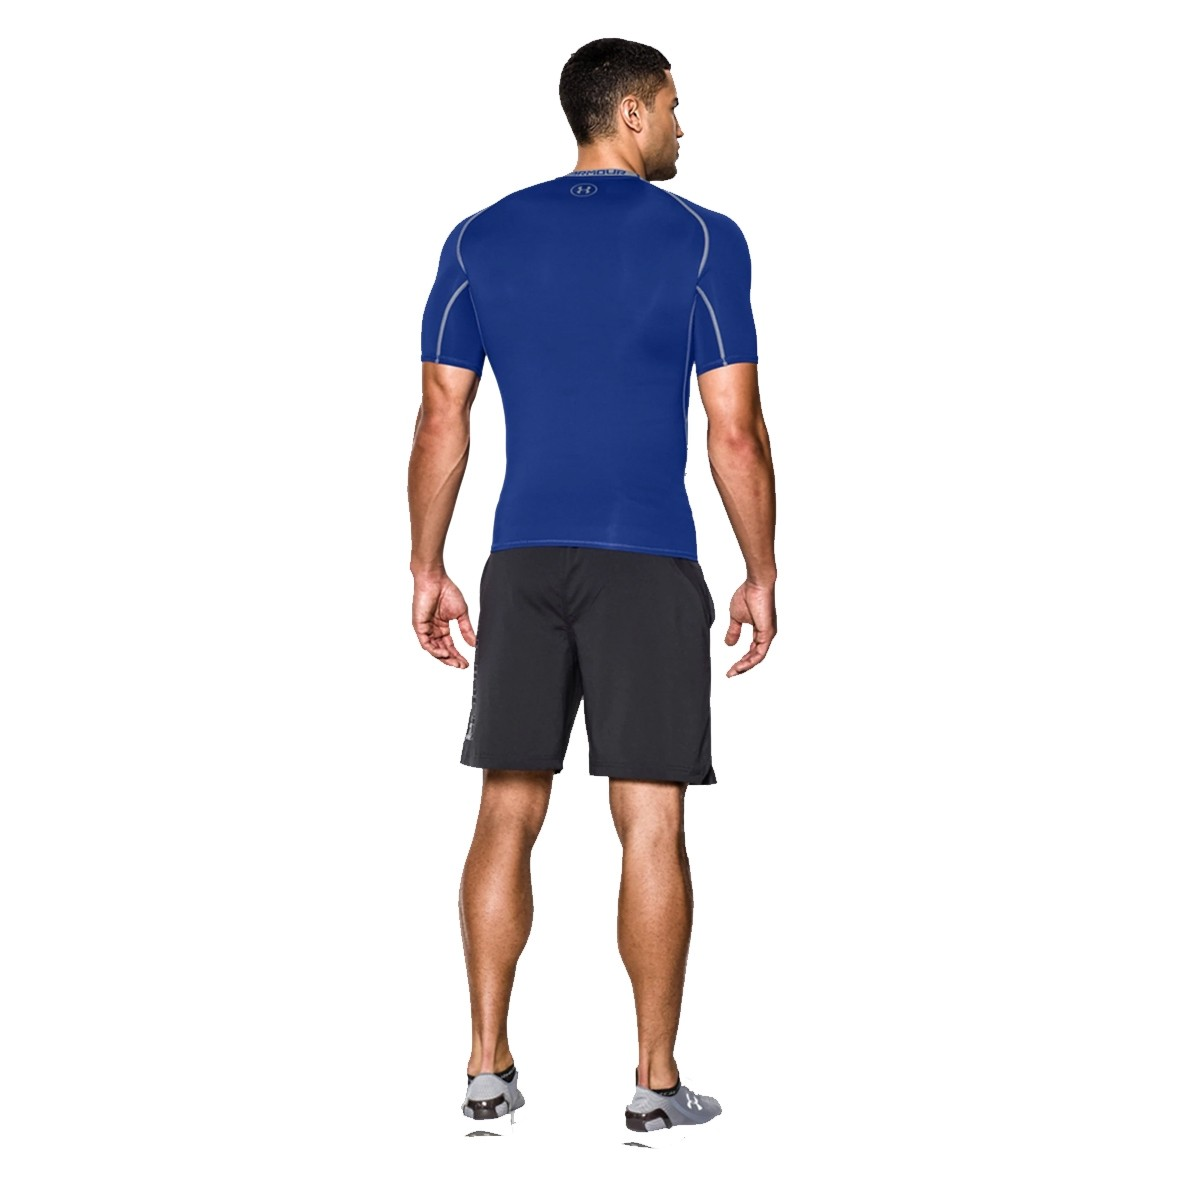 Camiseta Compresión Training HeatGear 'Blue'-1257468-400